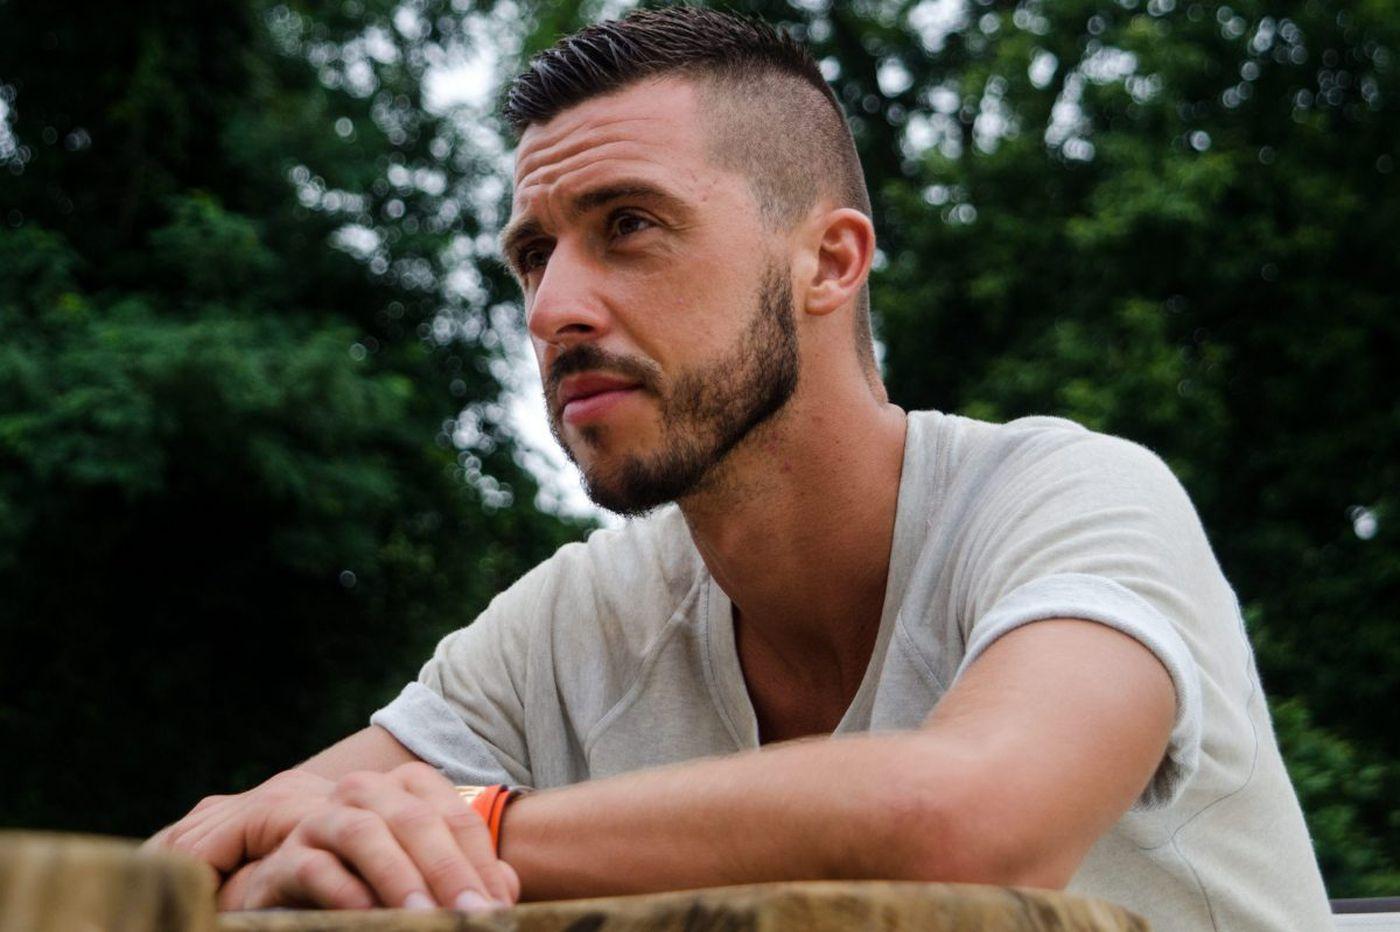 From Bosnian war to Philadelphia peace, the lifelong journey through soccer of the Union's Haris Medunjanin